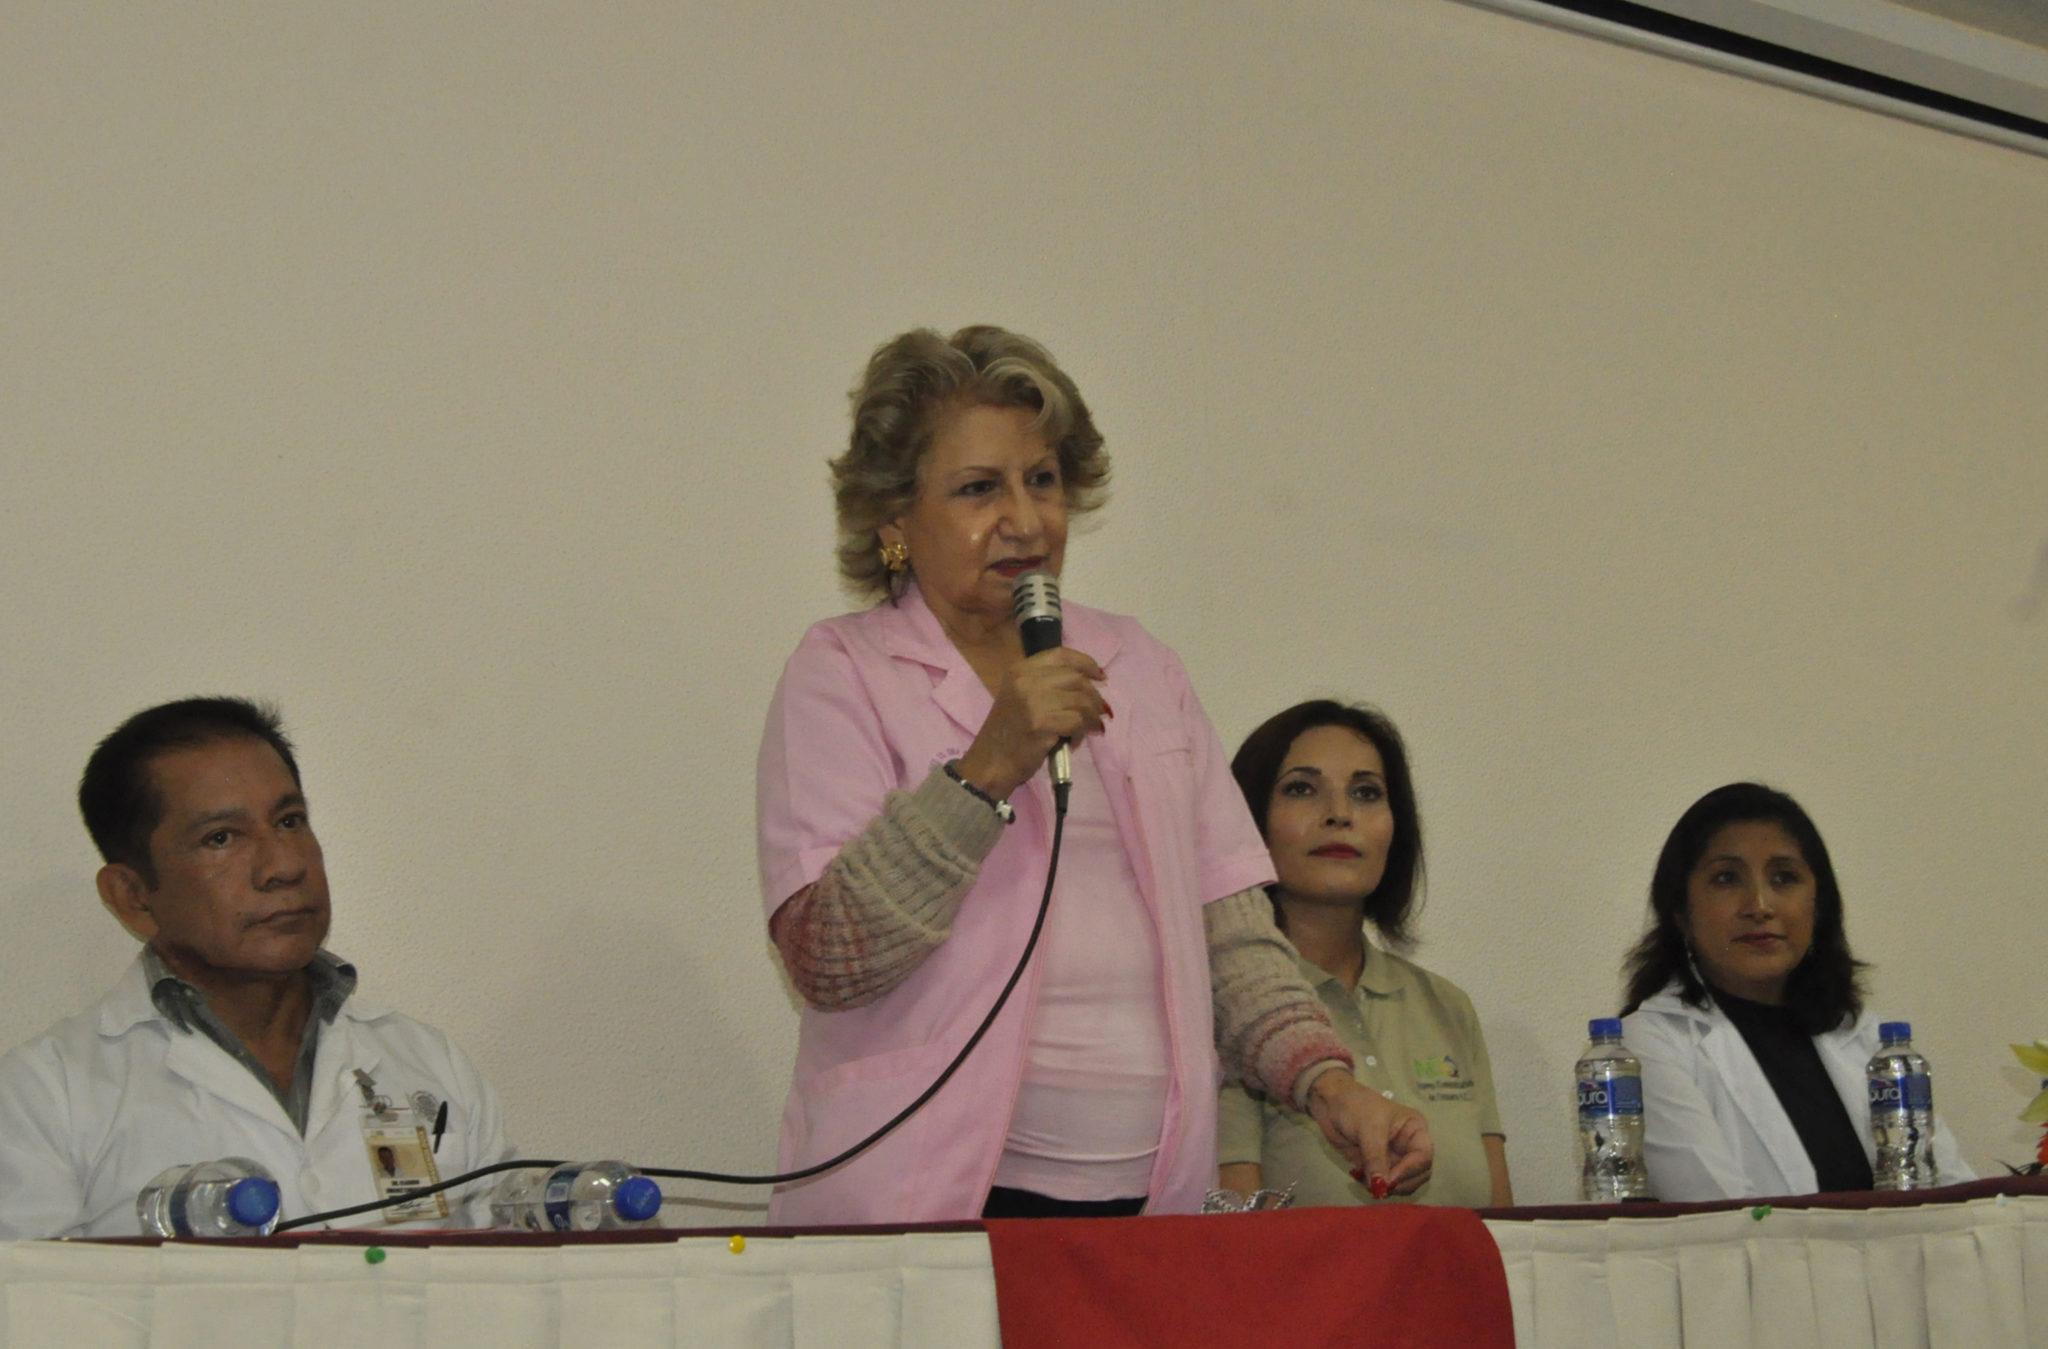 Jornada de mastografías beneficia a 447 mujeres en Oaxaca